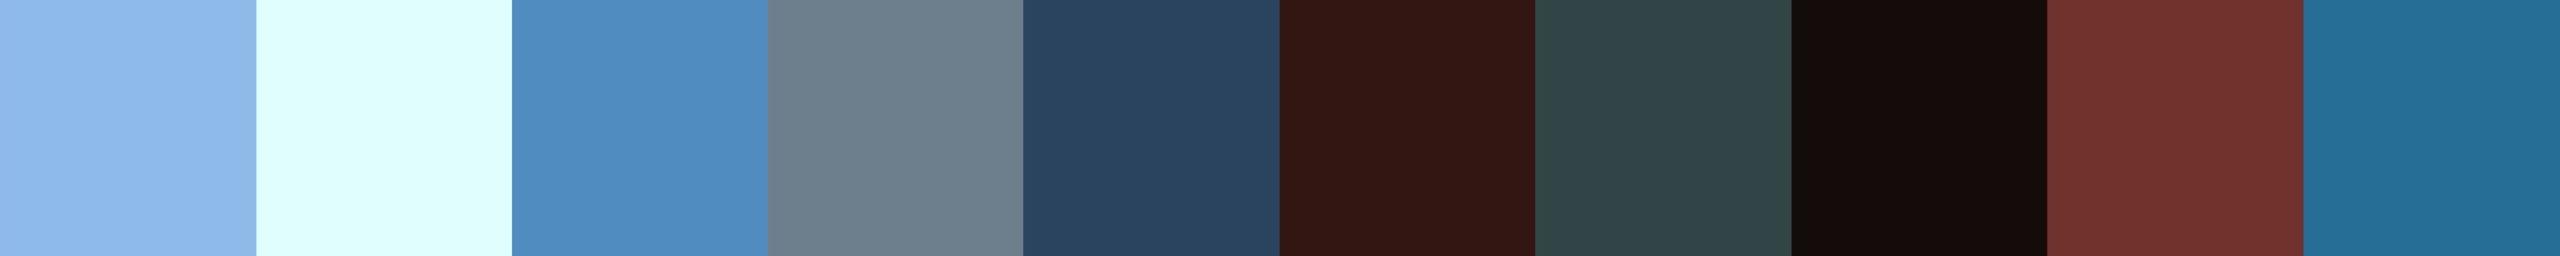 150 Agoena Color Palette